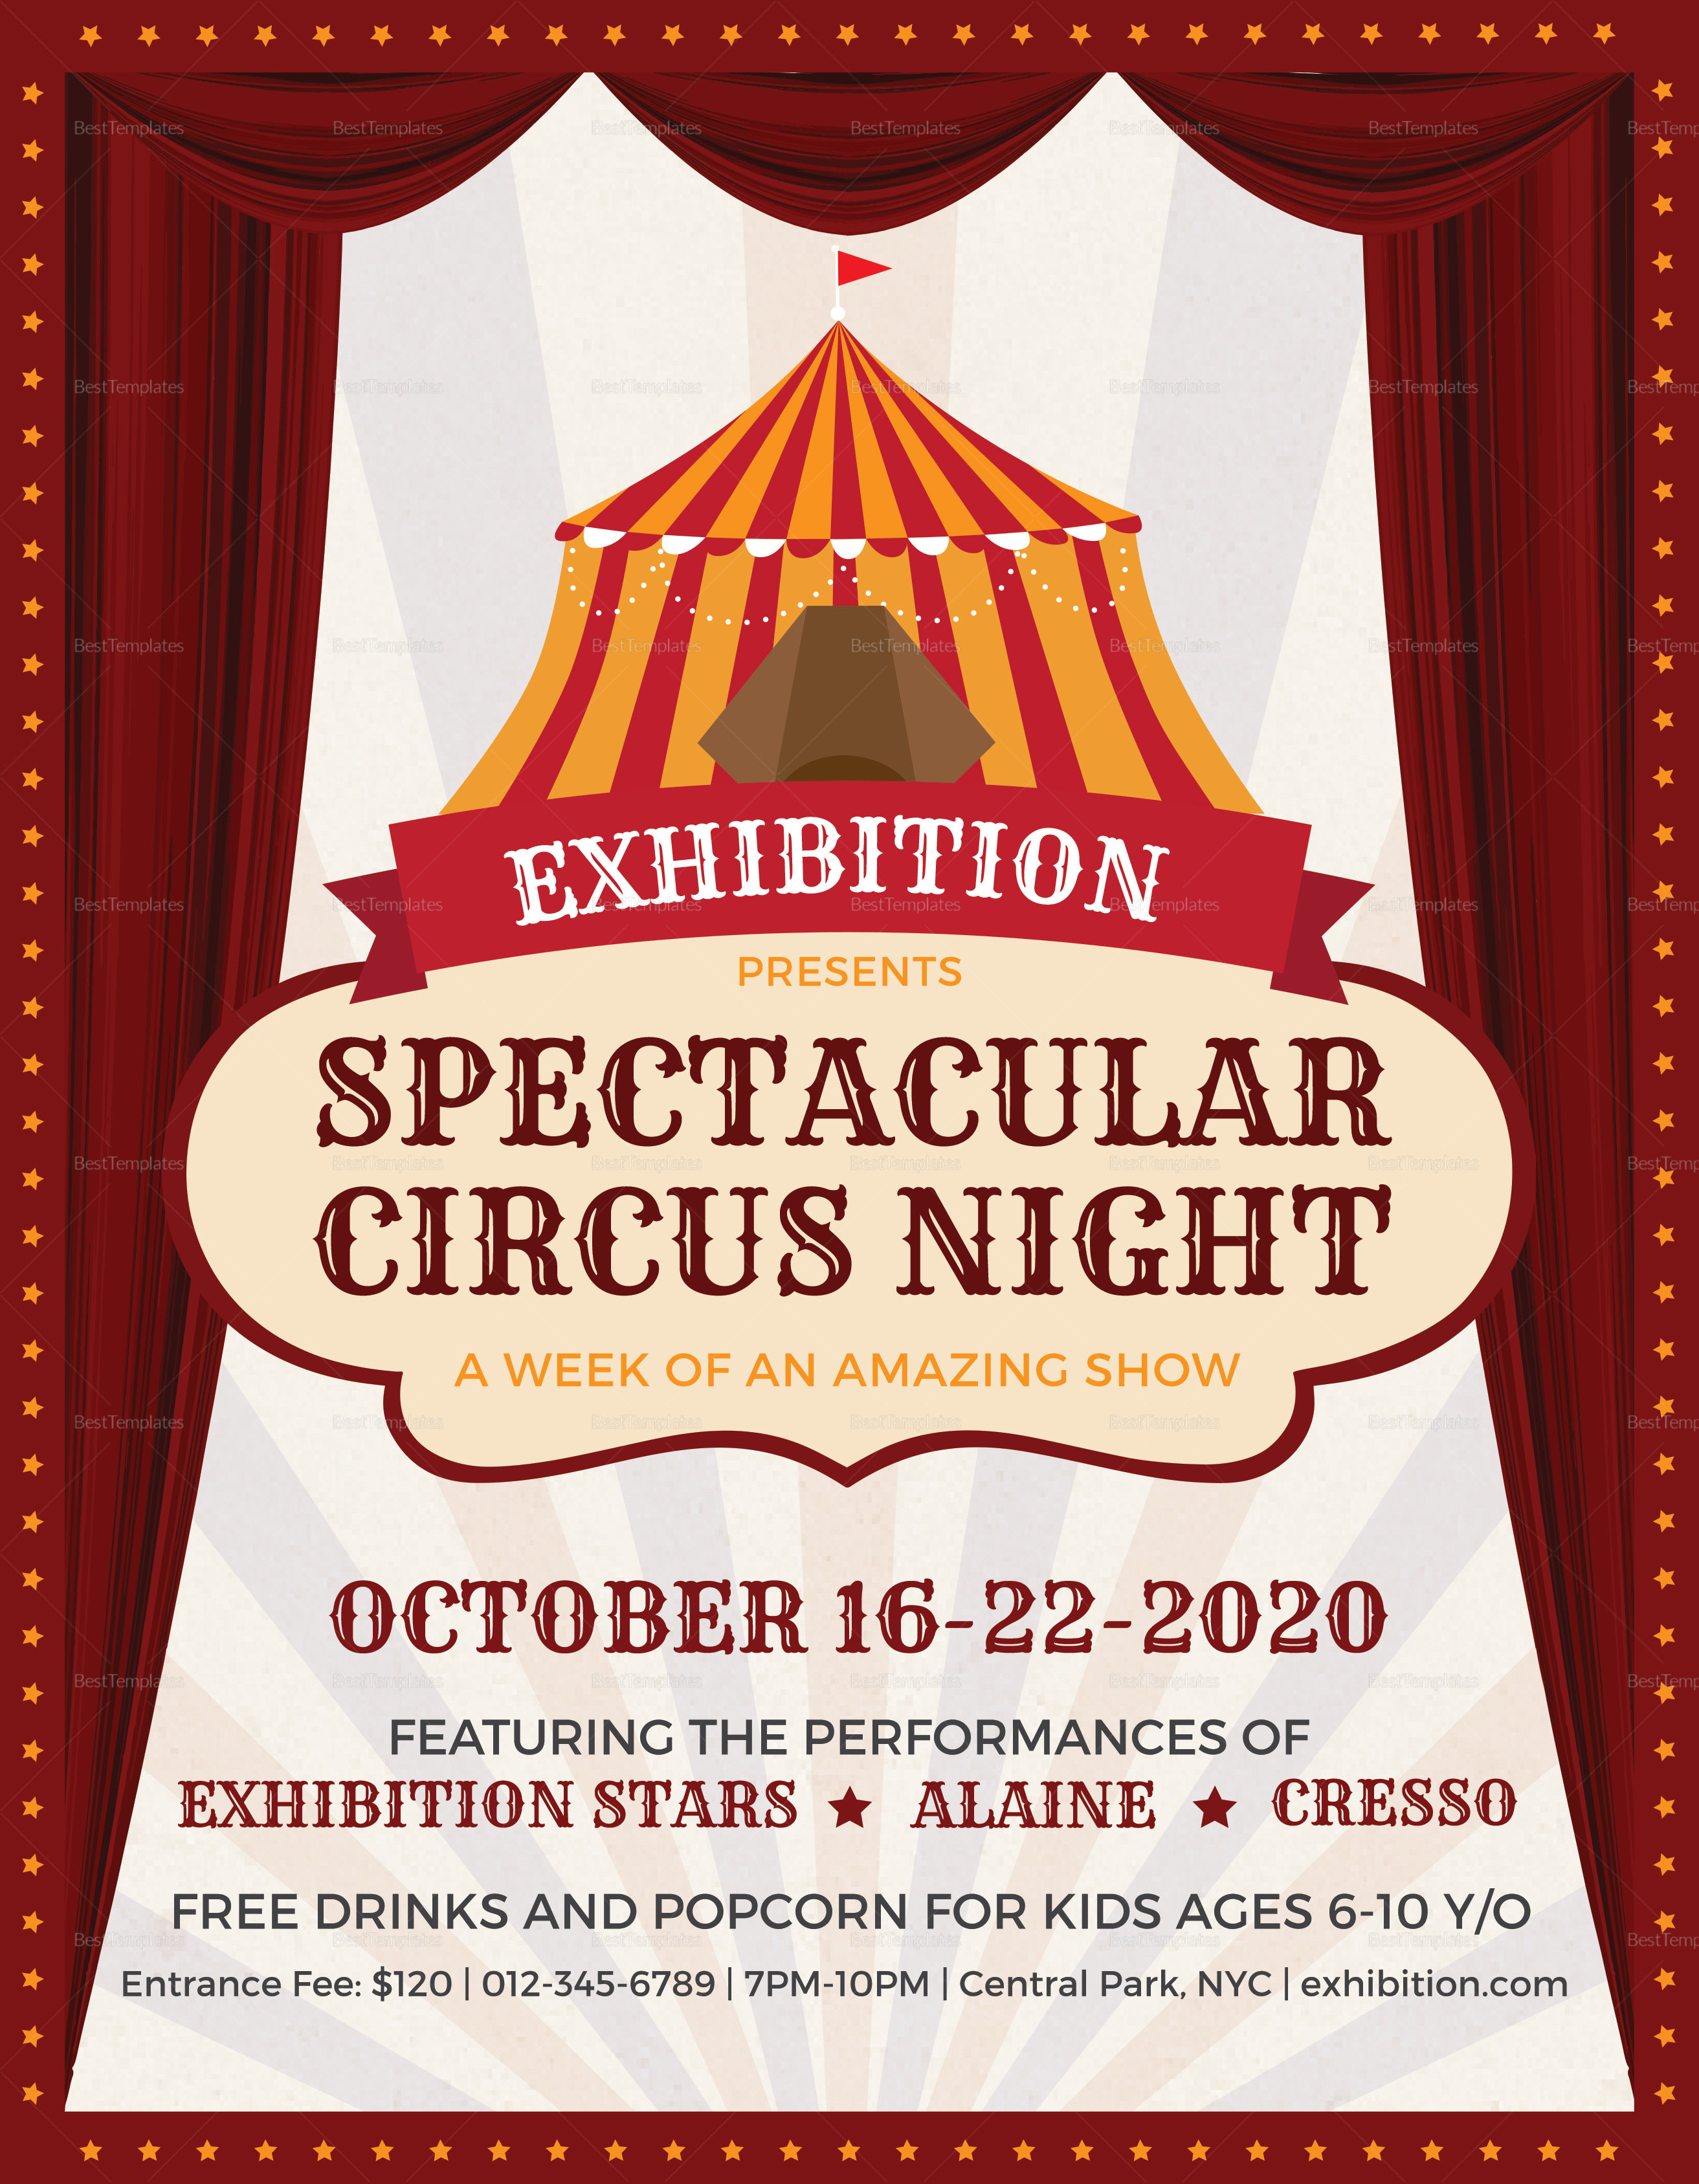 Spectacular Circus Night Flyer